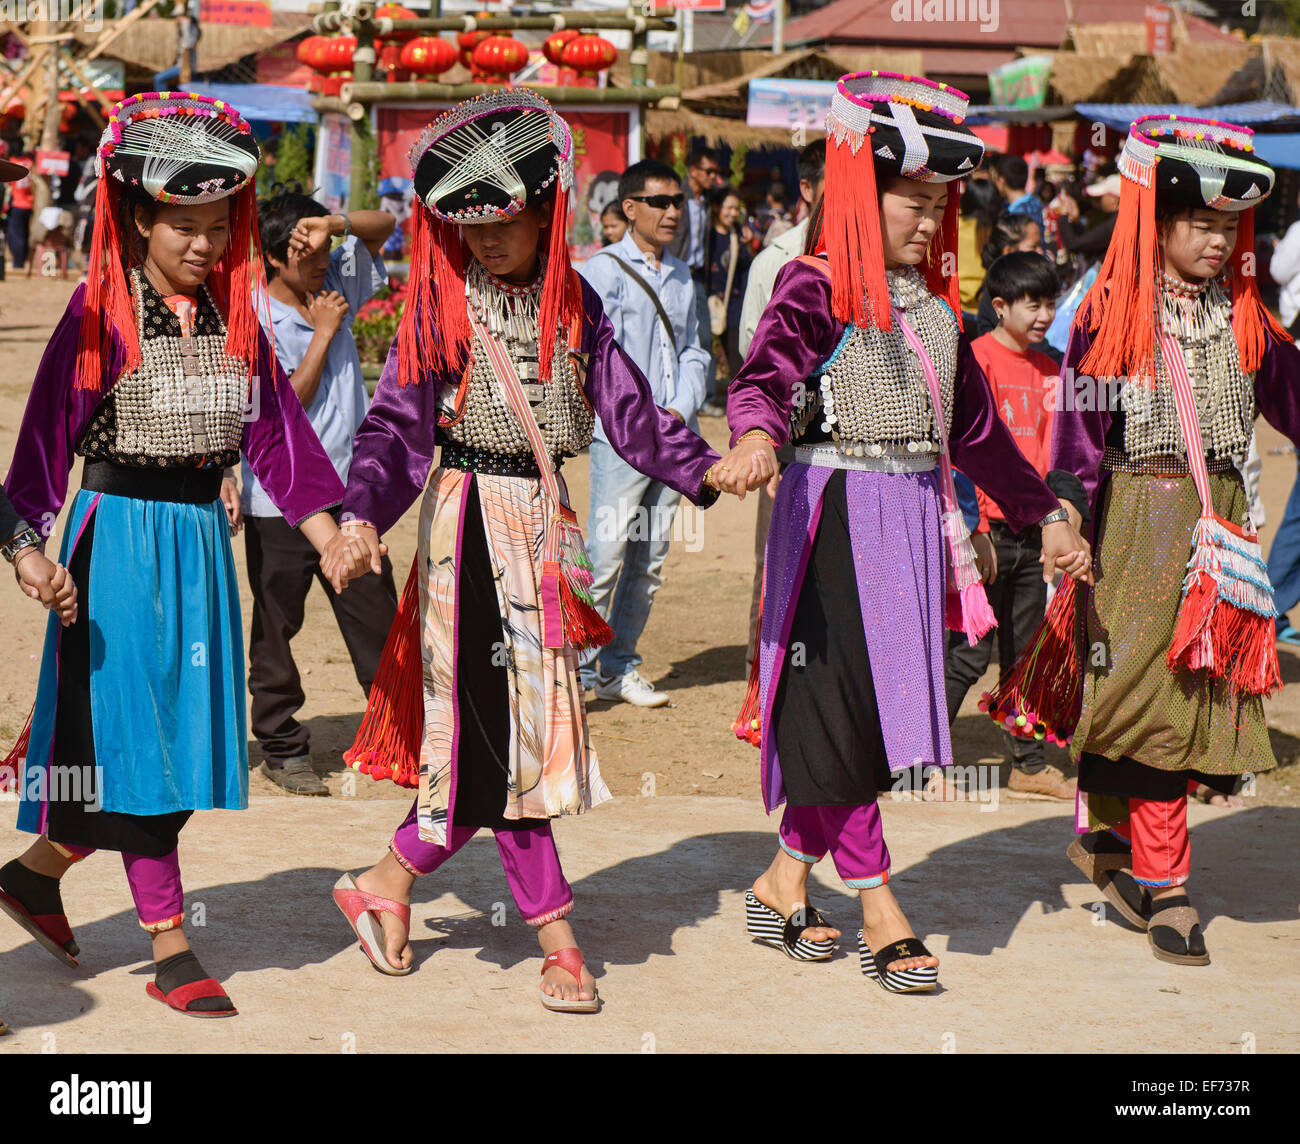 Lisu women dancing at the New Year Festival in Mae Salong, Chiang Rai Province, Thailand - Stock Image